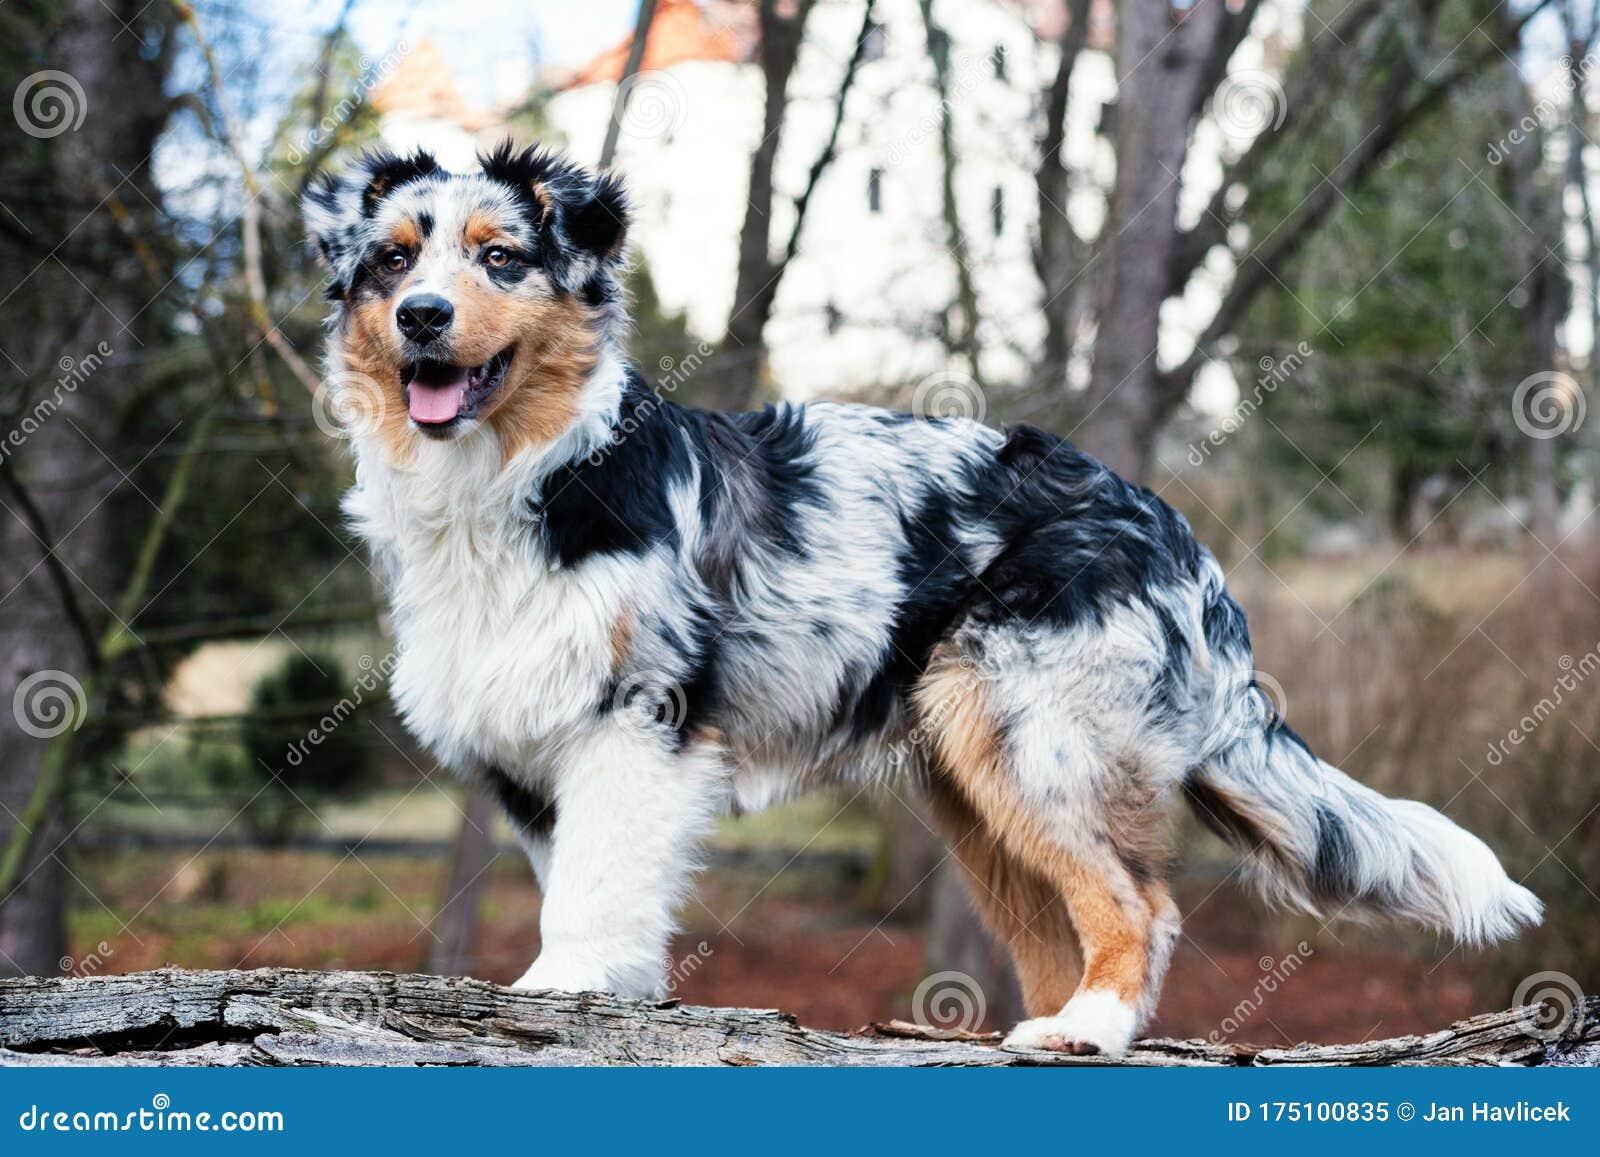 Australian Shepherd Puppy Stock Image Image Of Green 175100835